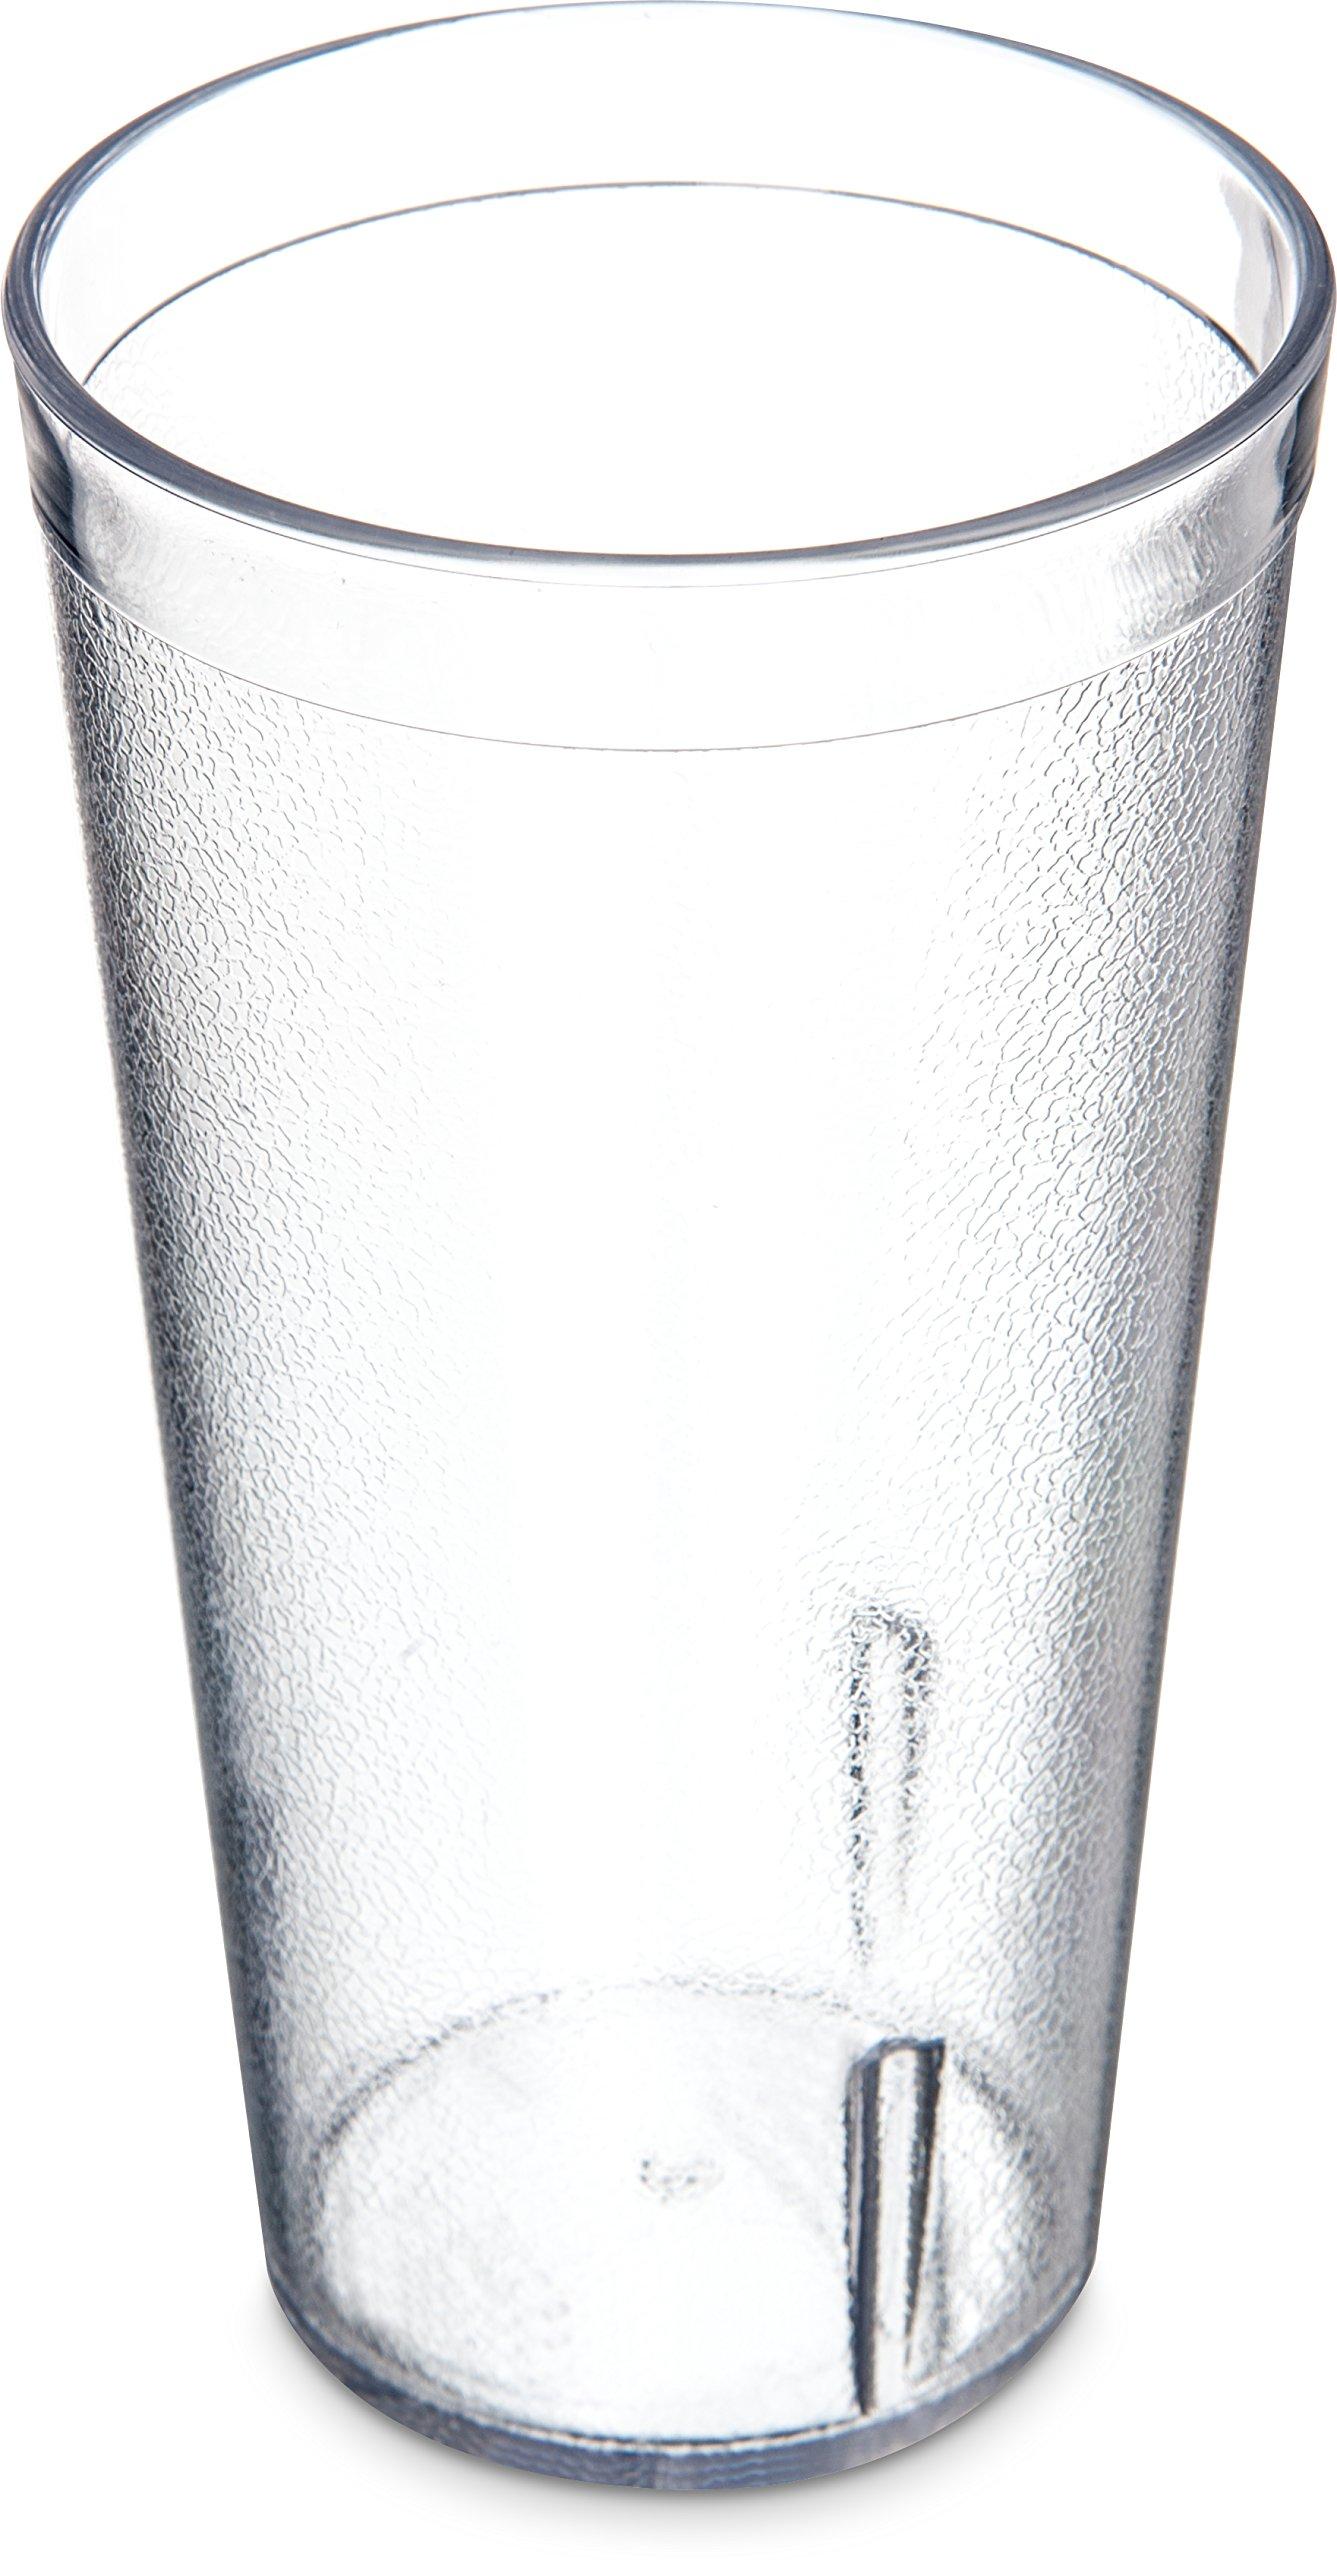 Carlisle 522007 Stackable Shatter-Resistant Plastic Tumbler, 20 oz., Clear (Case of 72)